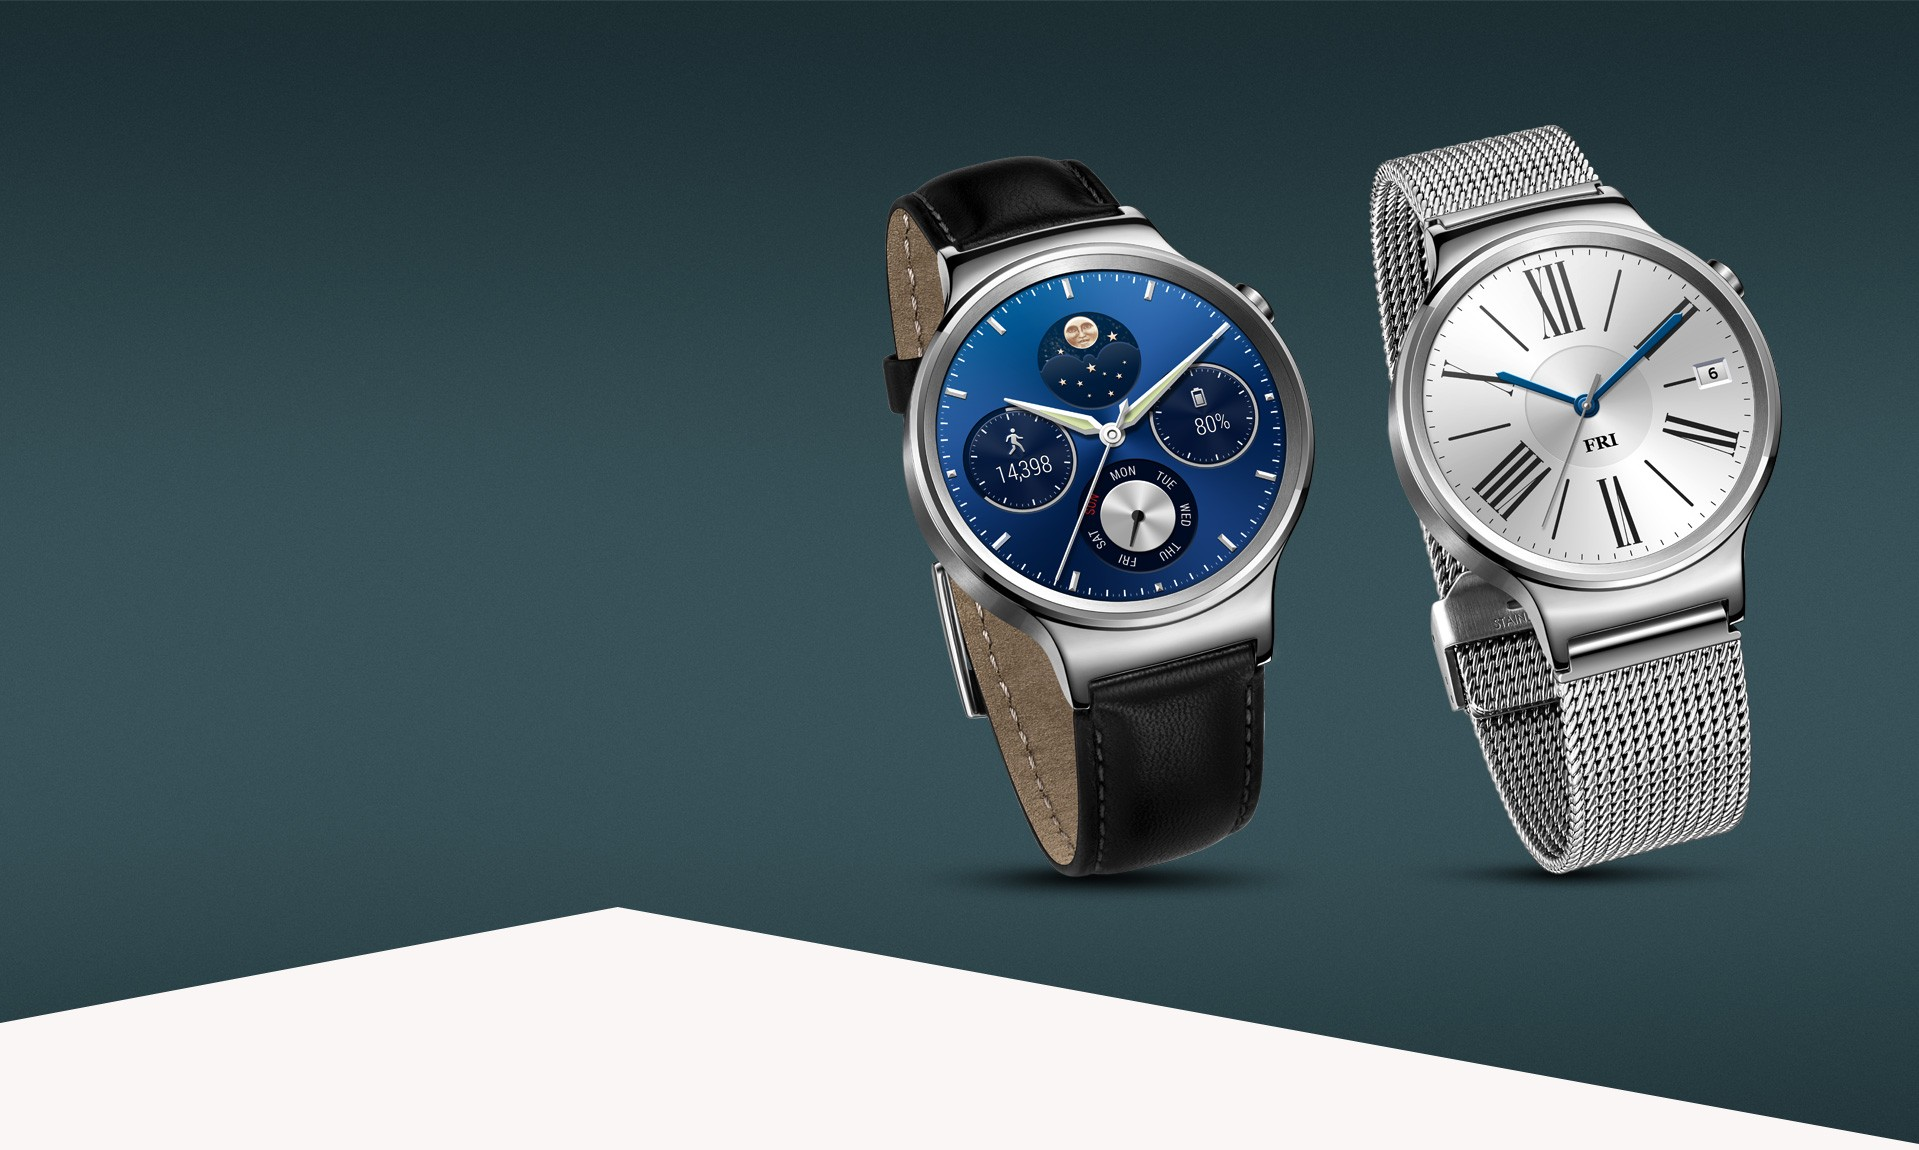 HUAWEI WATCH - Wearables & Smart Watch | HUAWEI Philippines